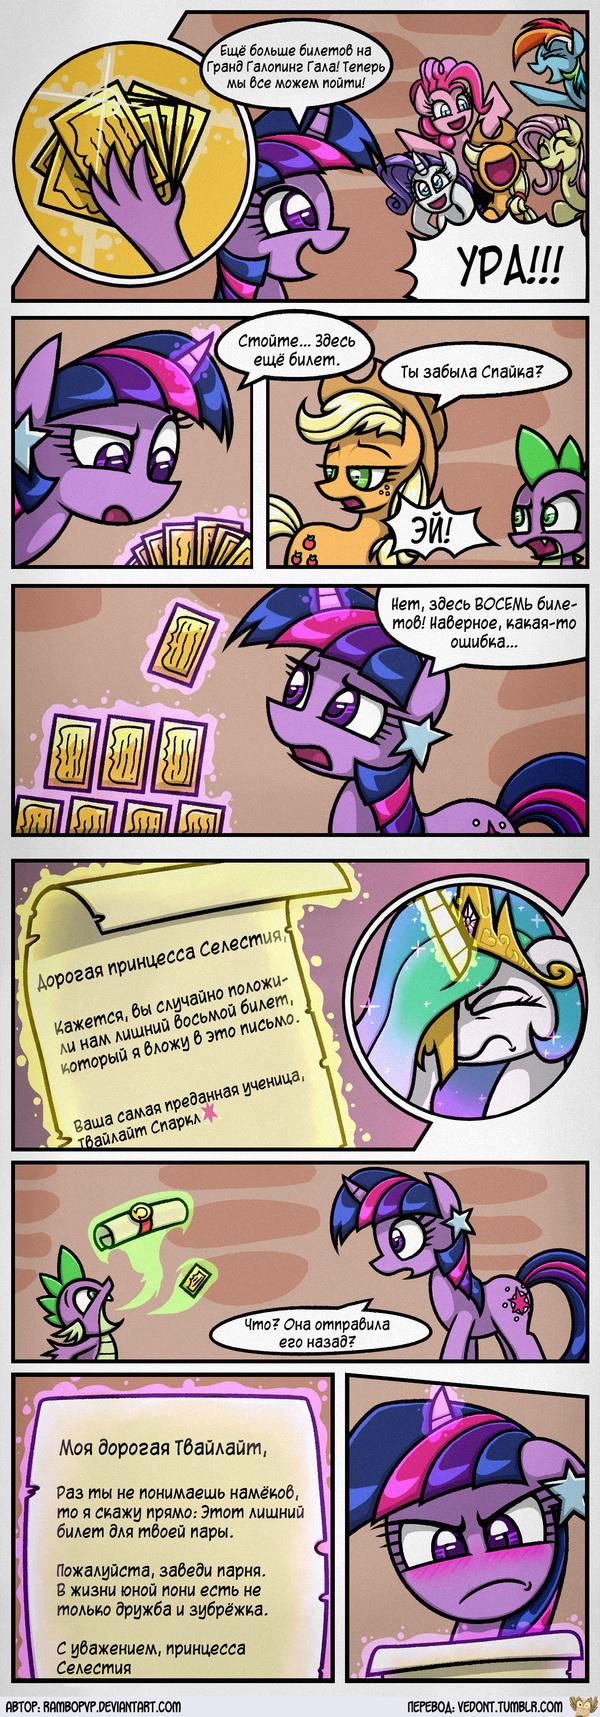 [Перевод] Лишний билет перевод, Комиксы, my little pony, Twilight Sparkle, Princess Celestia, mane 6, длиннопост